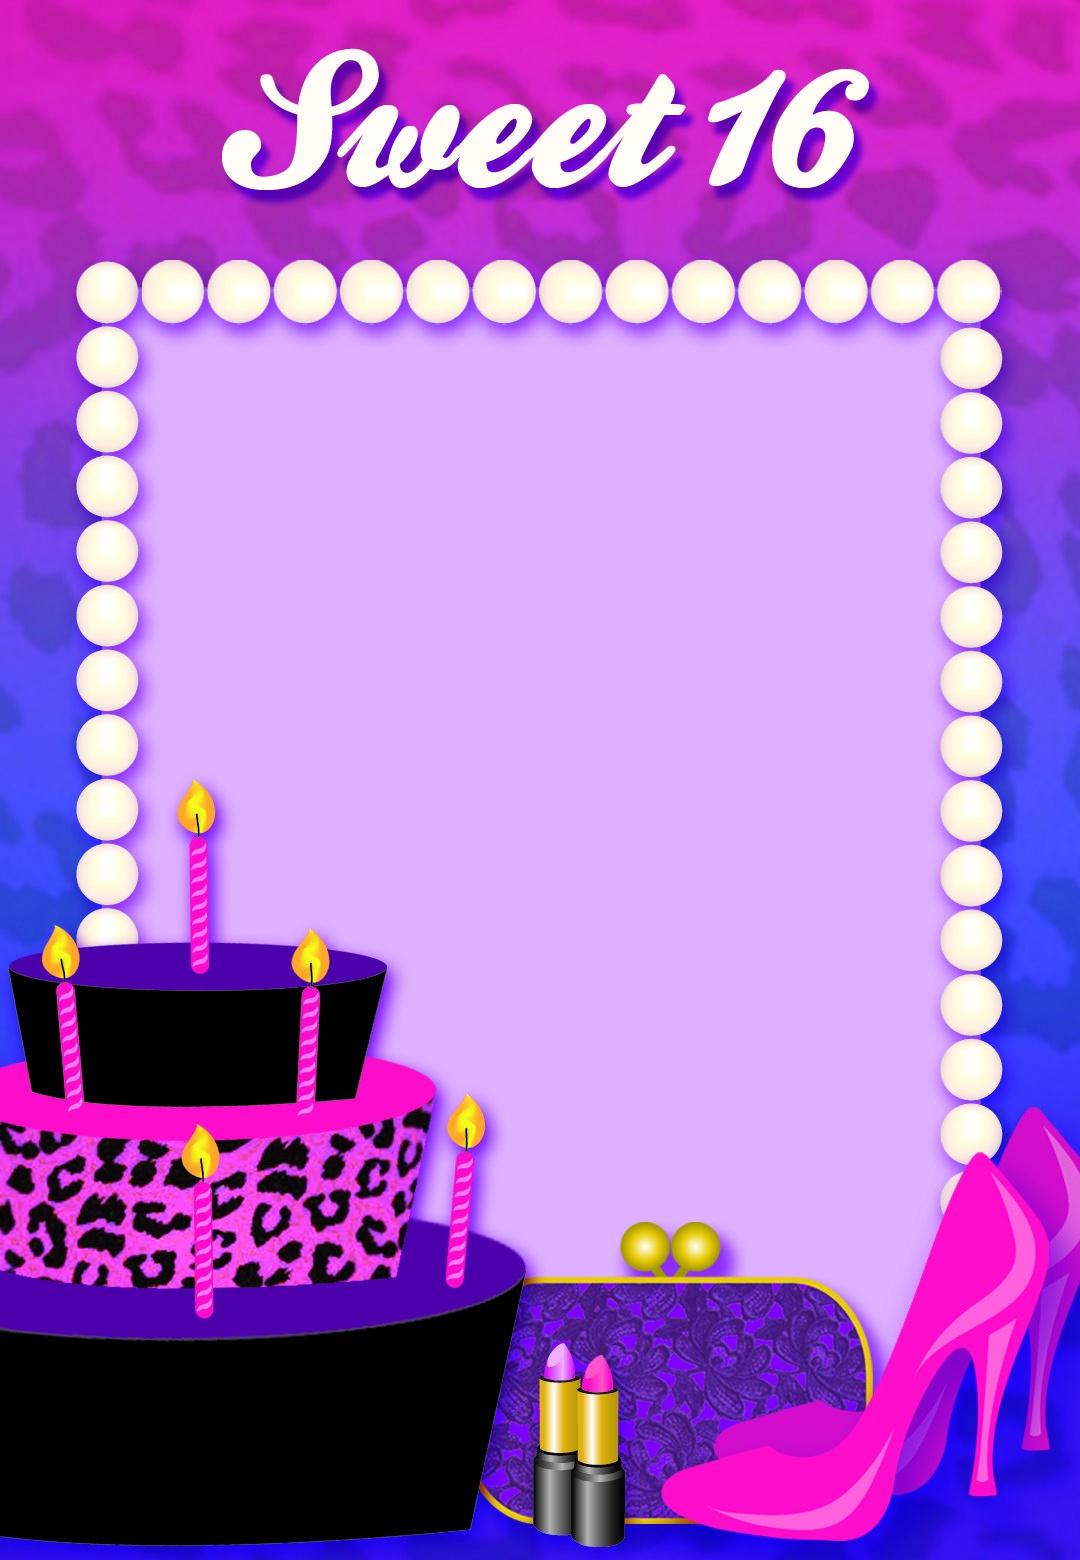 Free Printable Sweet 16 Birthday Invitation | Birthday | Free - Free Printable 16Th Birthday Party Invitation Templates